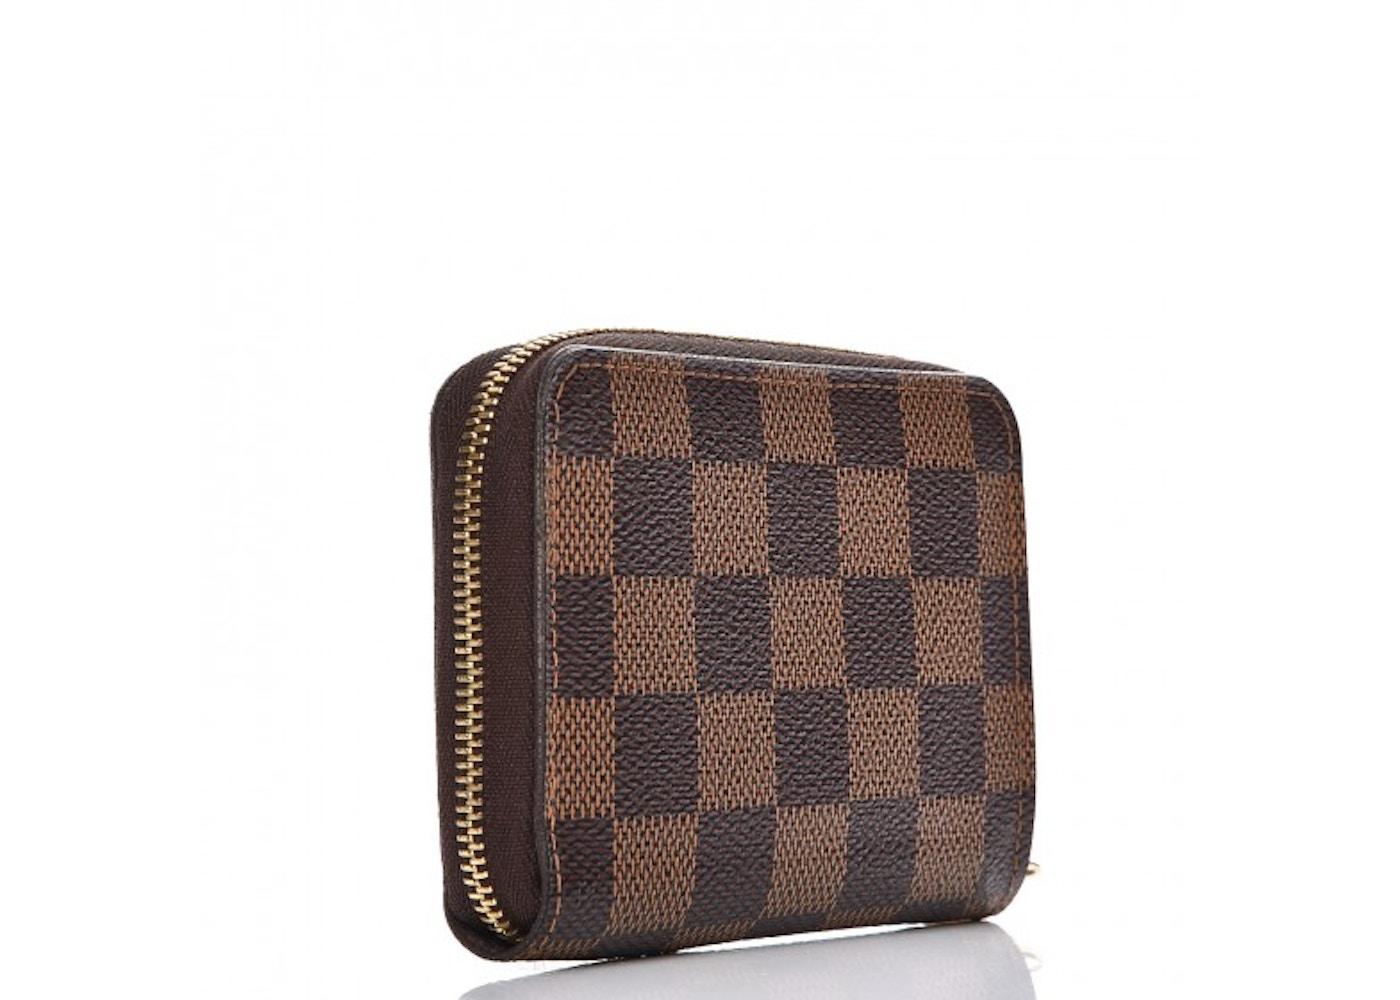 4caecac28d9e5 Buy   Sell Louis Vuitton Luxury Handbags